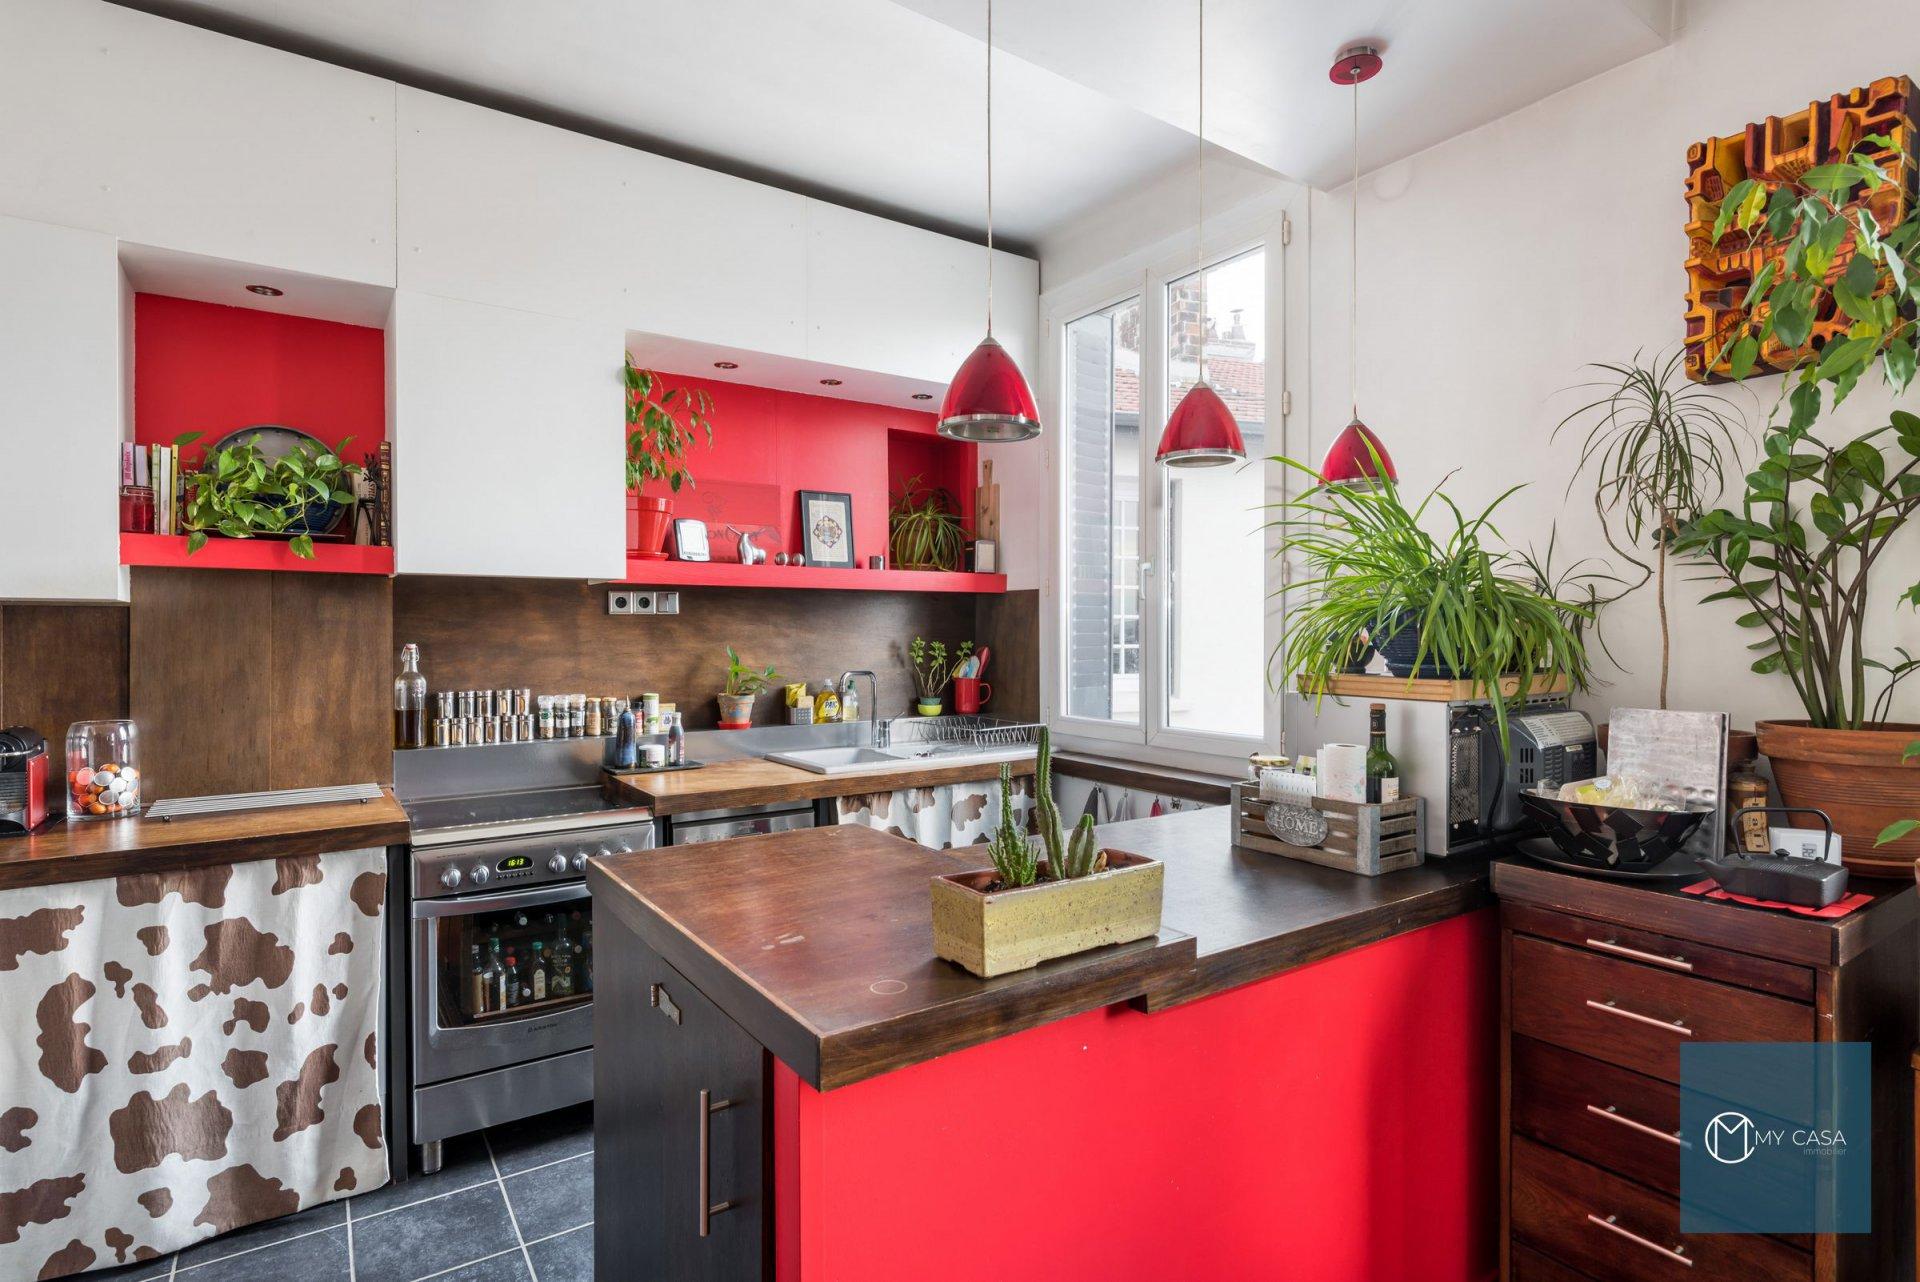 JEAN MACE / BERTHELOT - Bel appartement de 70 m2 - Dernier Etage